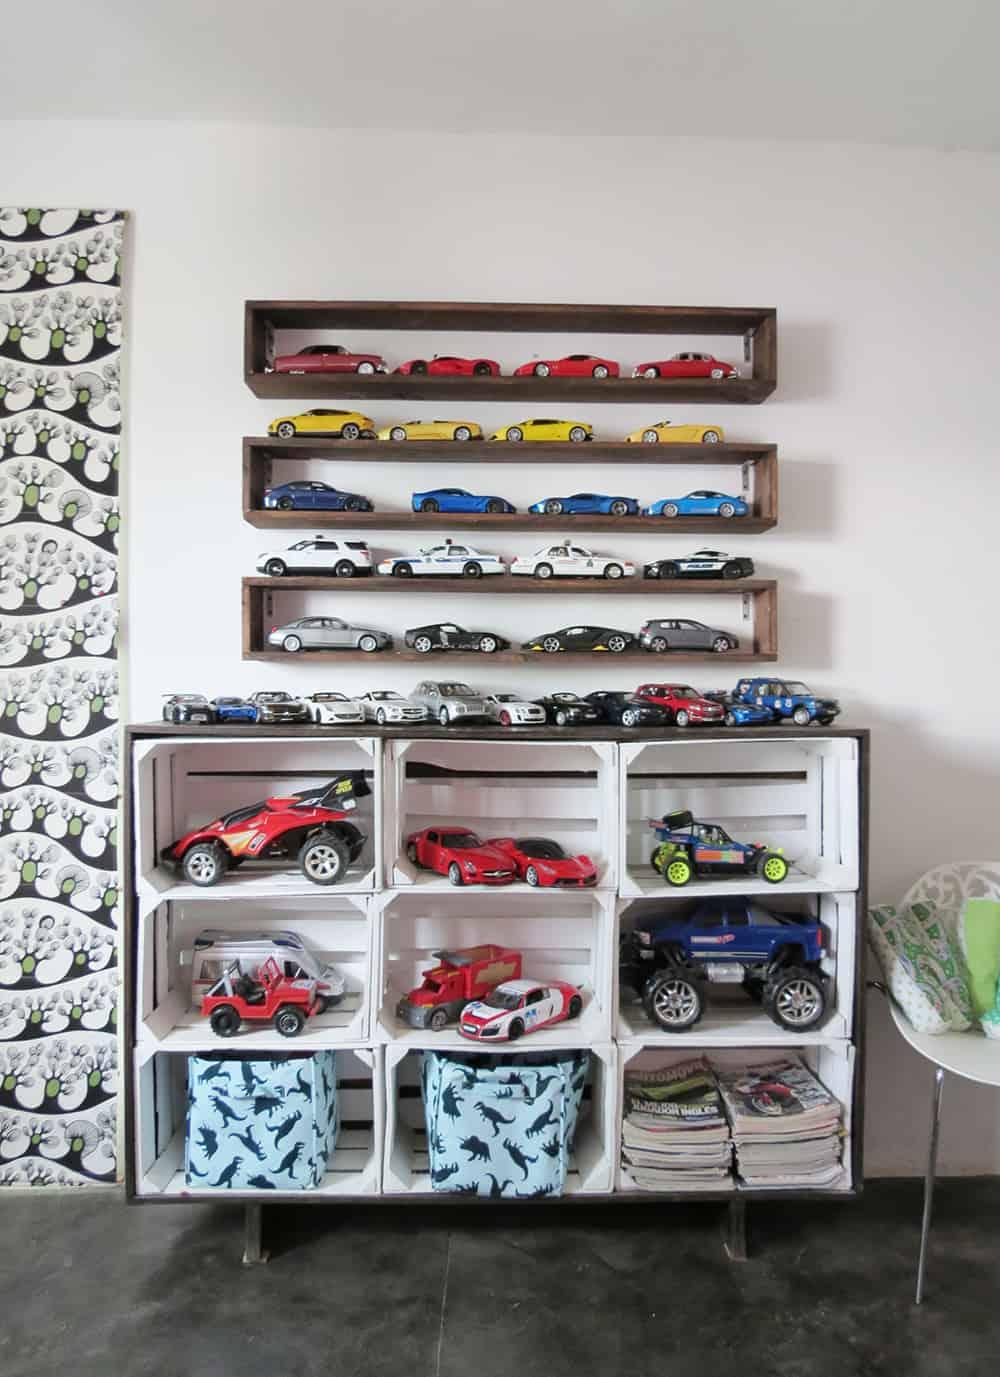 diy storage in kid's bedroom